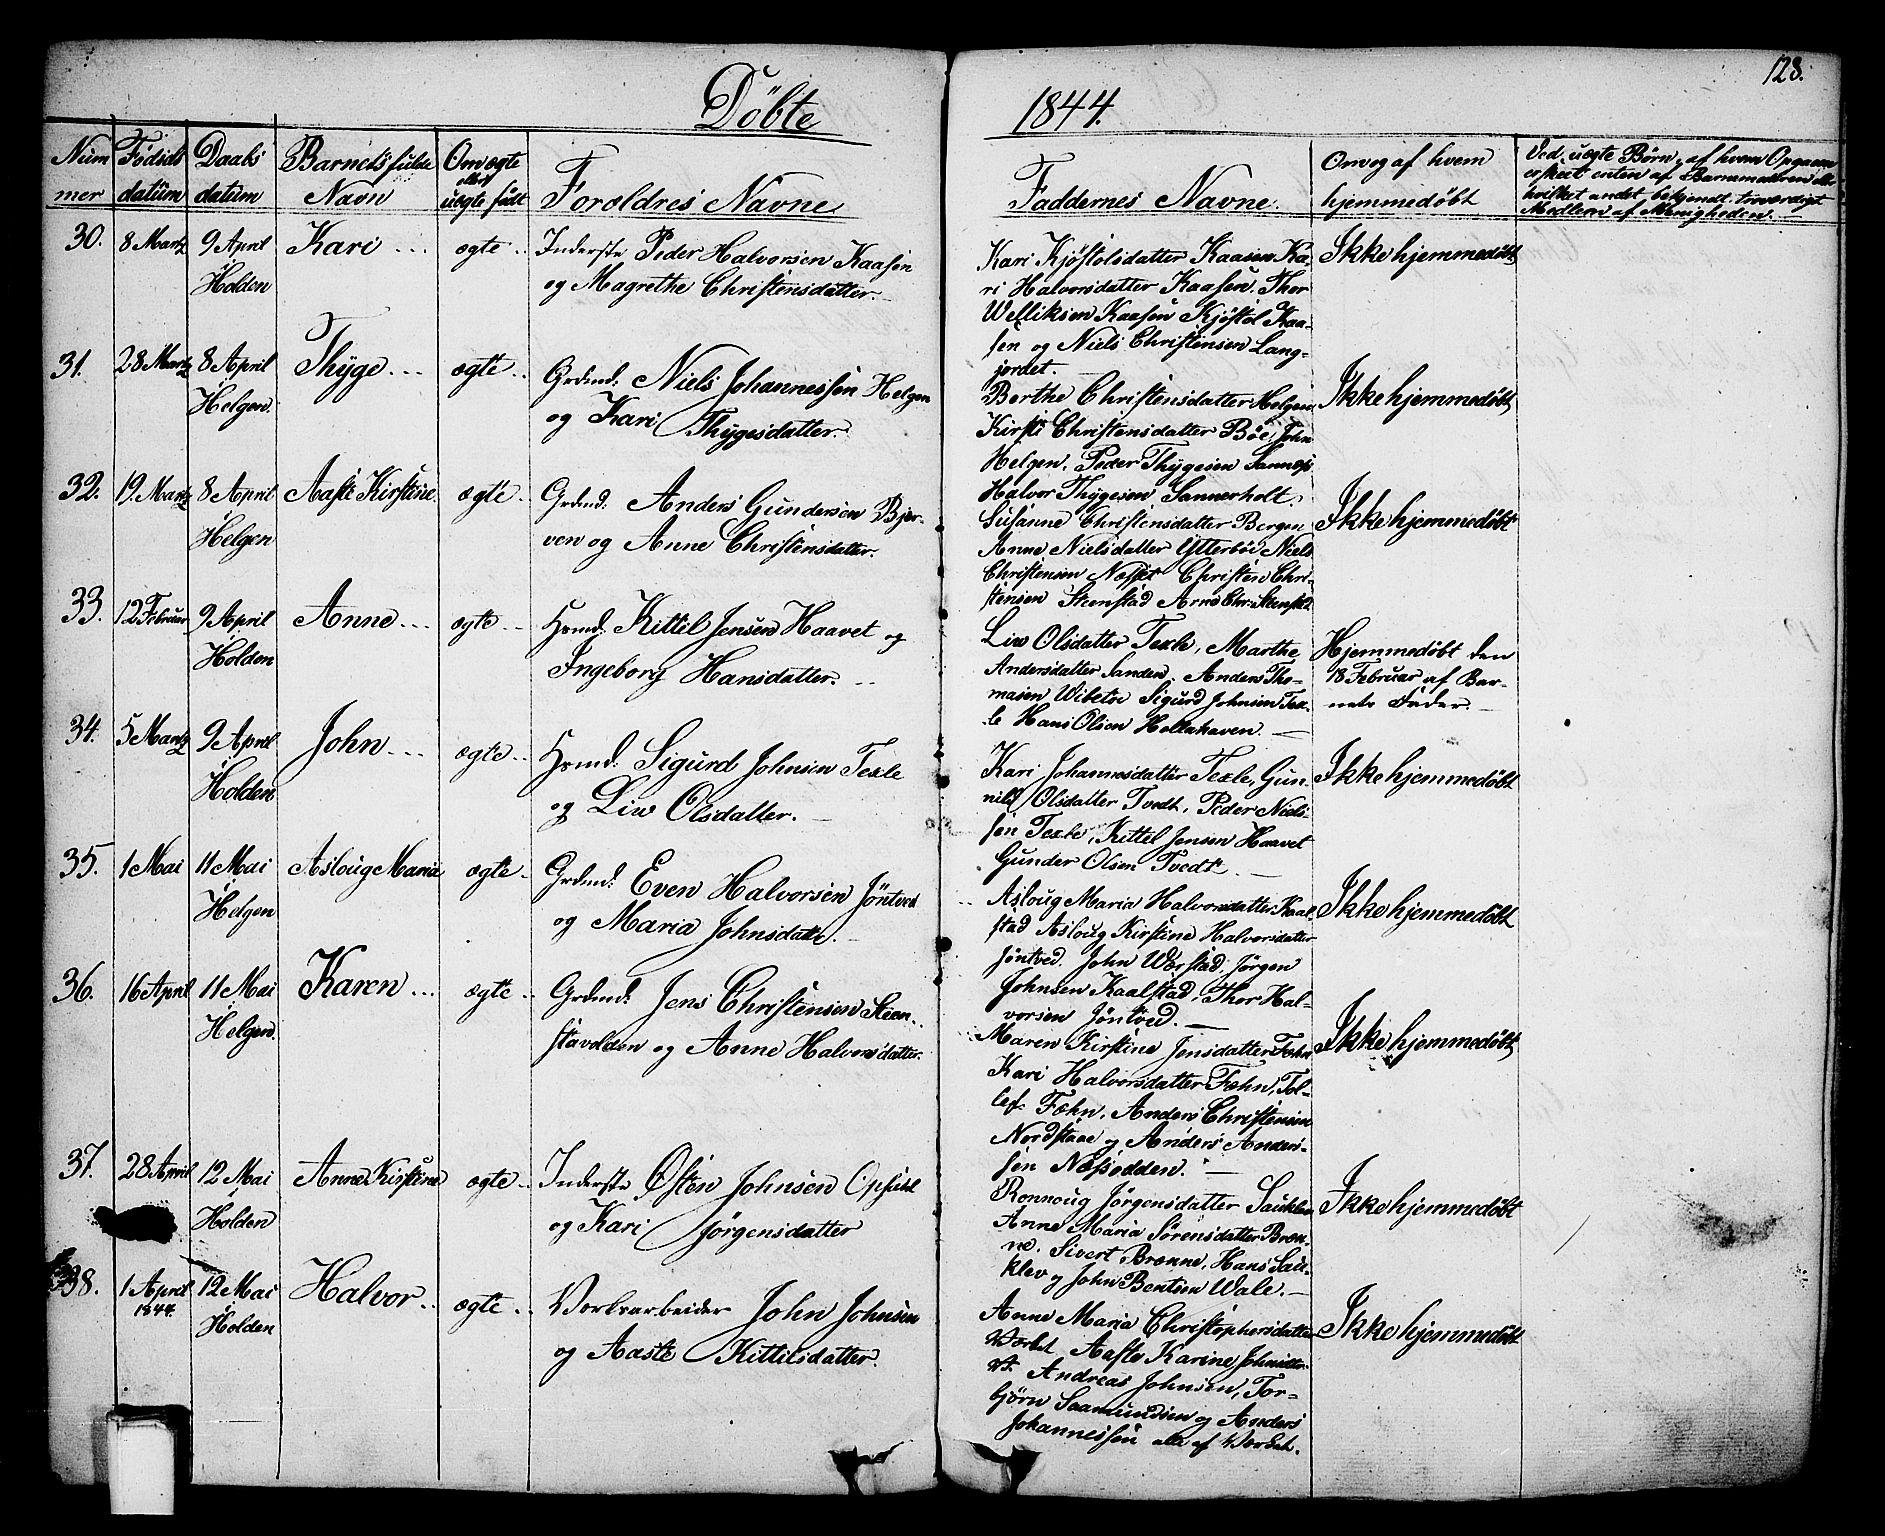 SAKO, Holla kirkebøker, F/Fa/L0004: Ministerialbok nr. 4, 1830-1848, s. 128